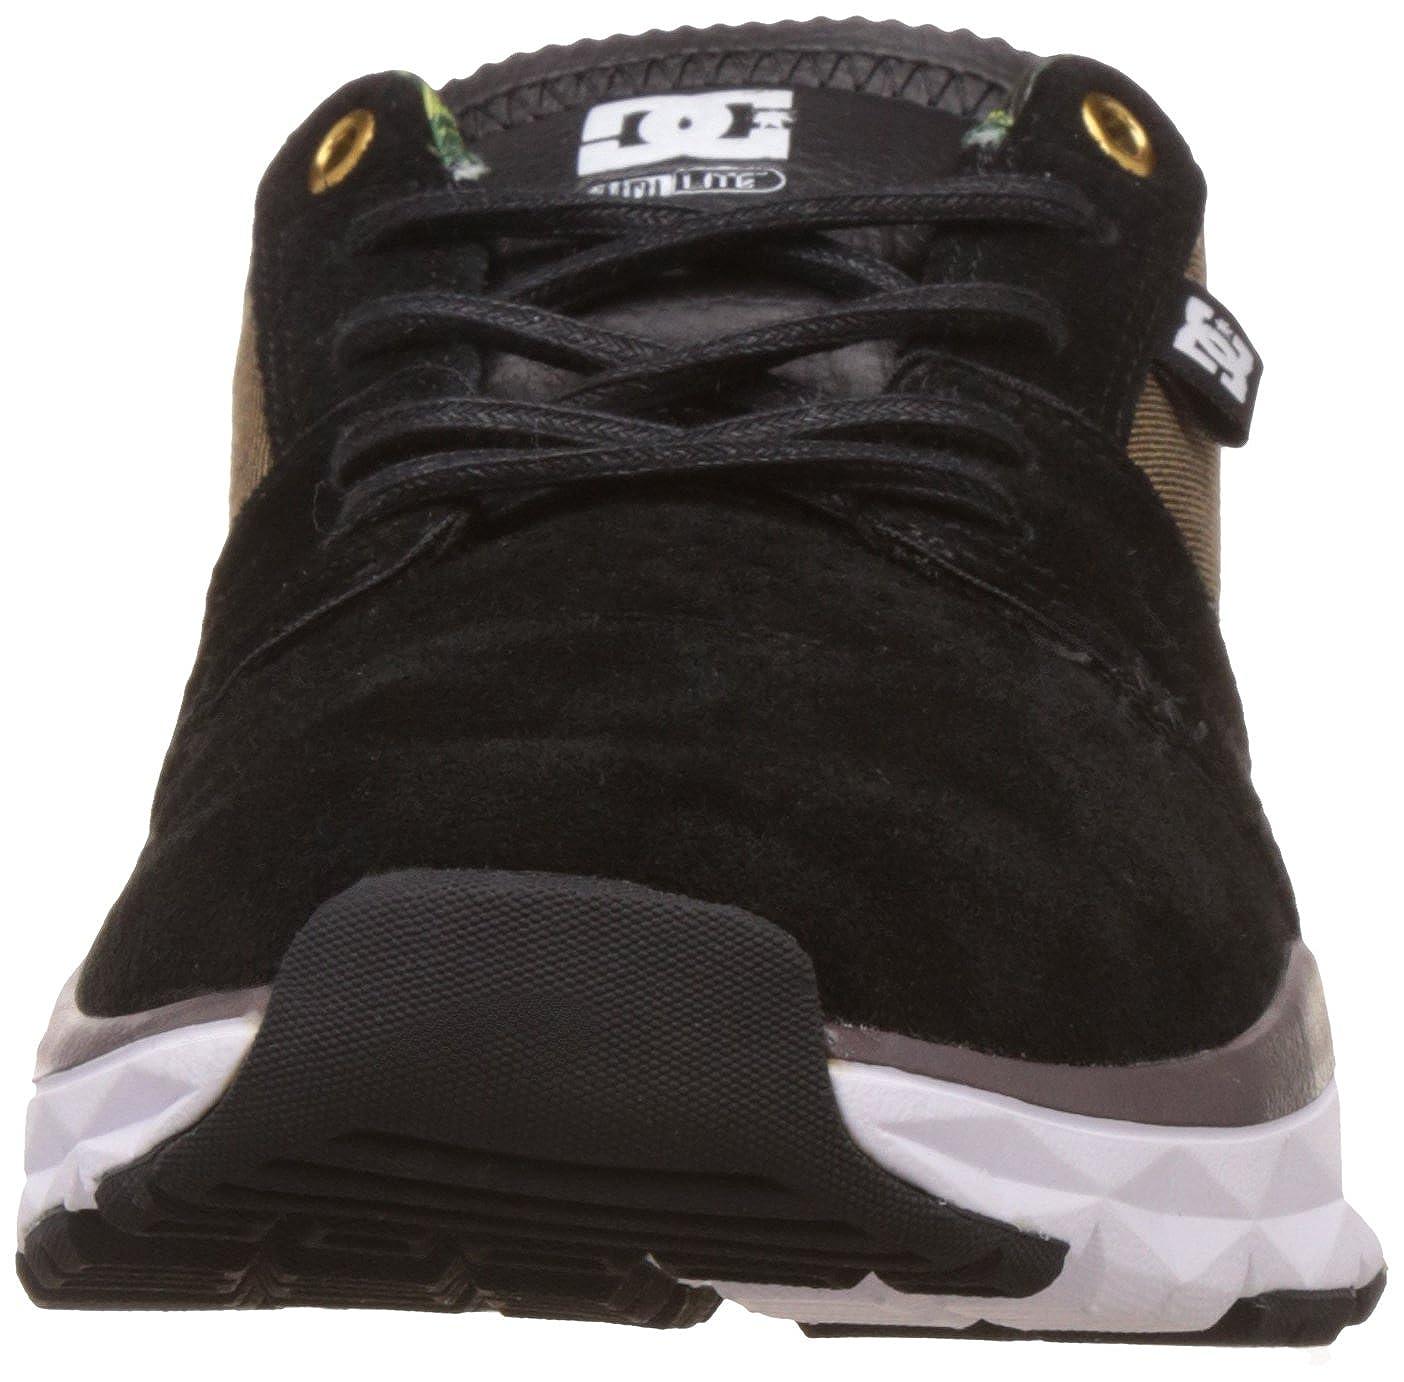 Player Dc De Se Shoes Schuhe Homme Skateboard Chaussures Herren zBwptB